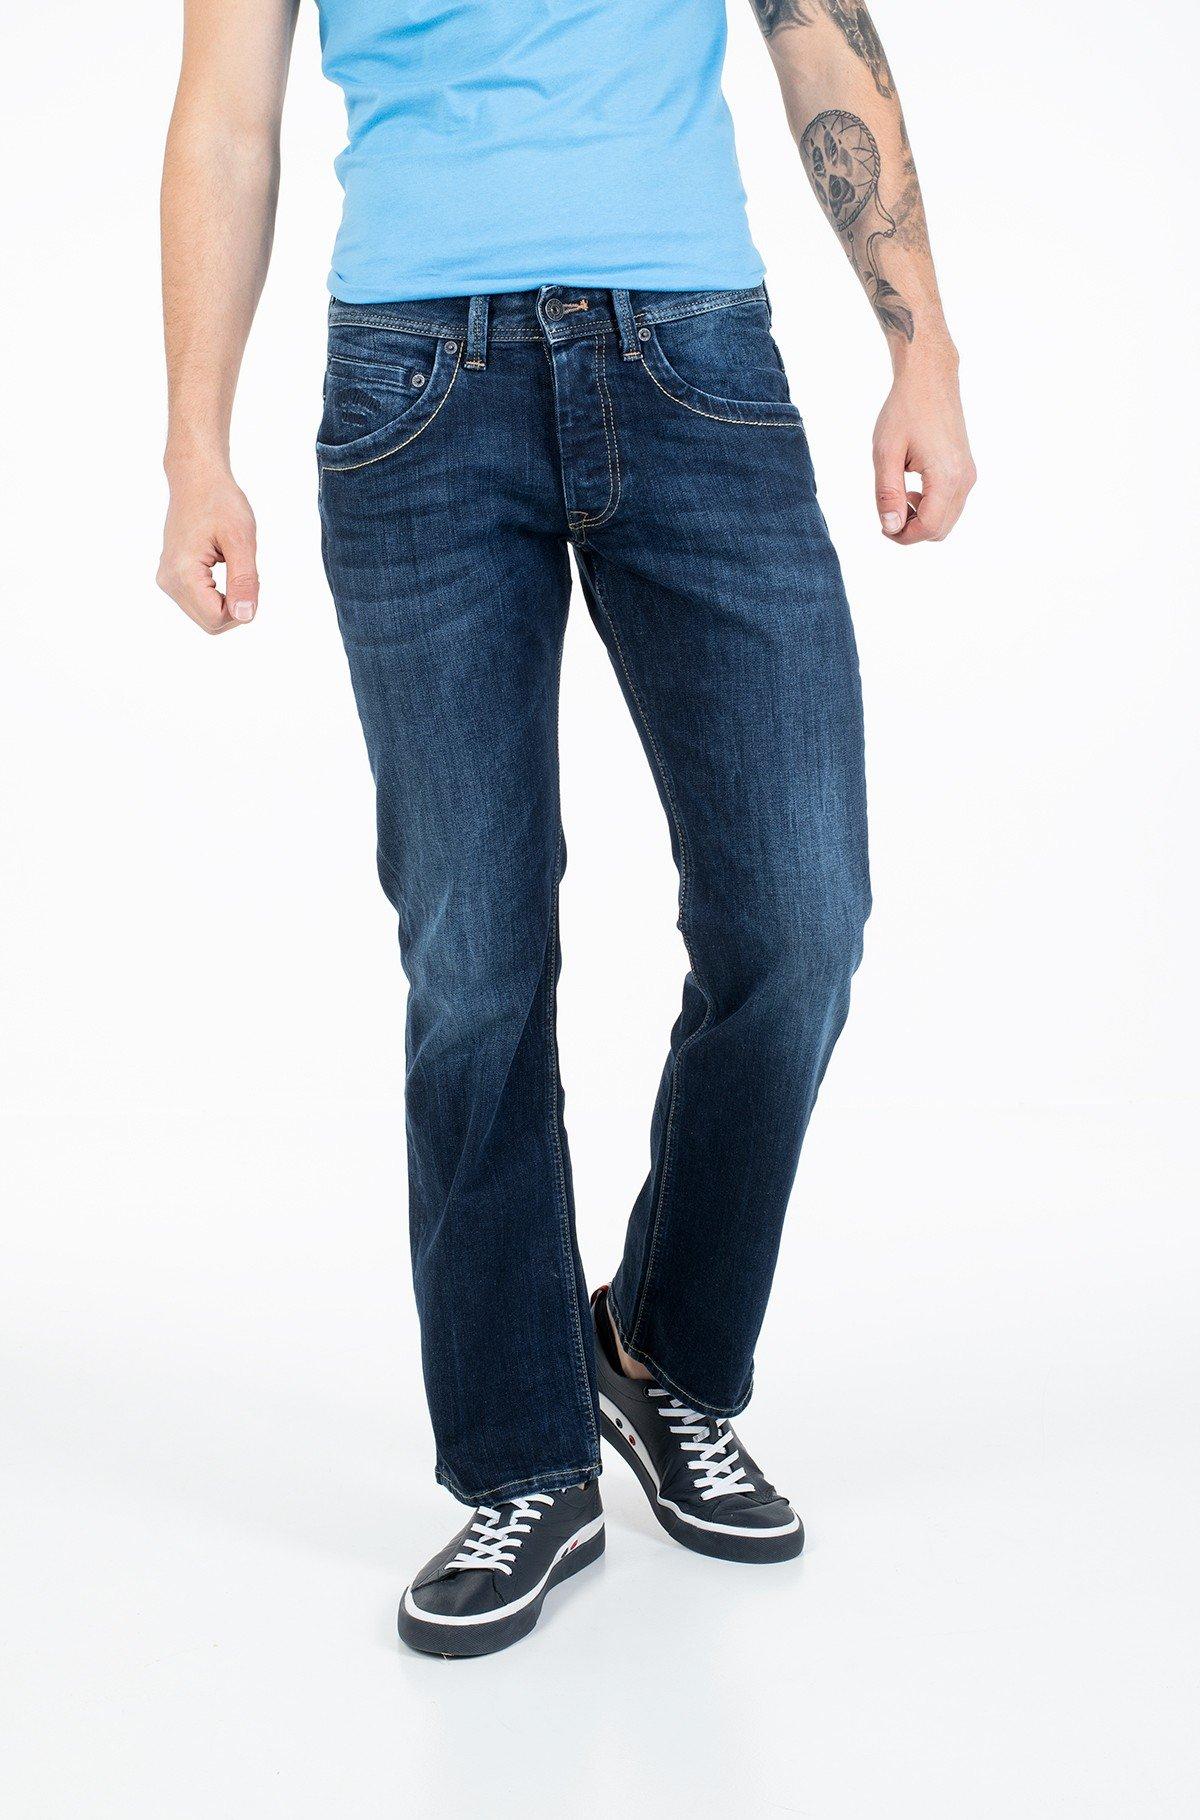 Jeans JEANIUS/PM200016Z45-full-1